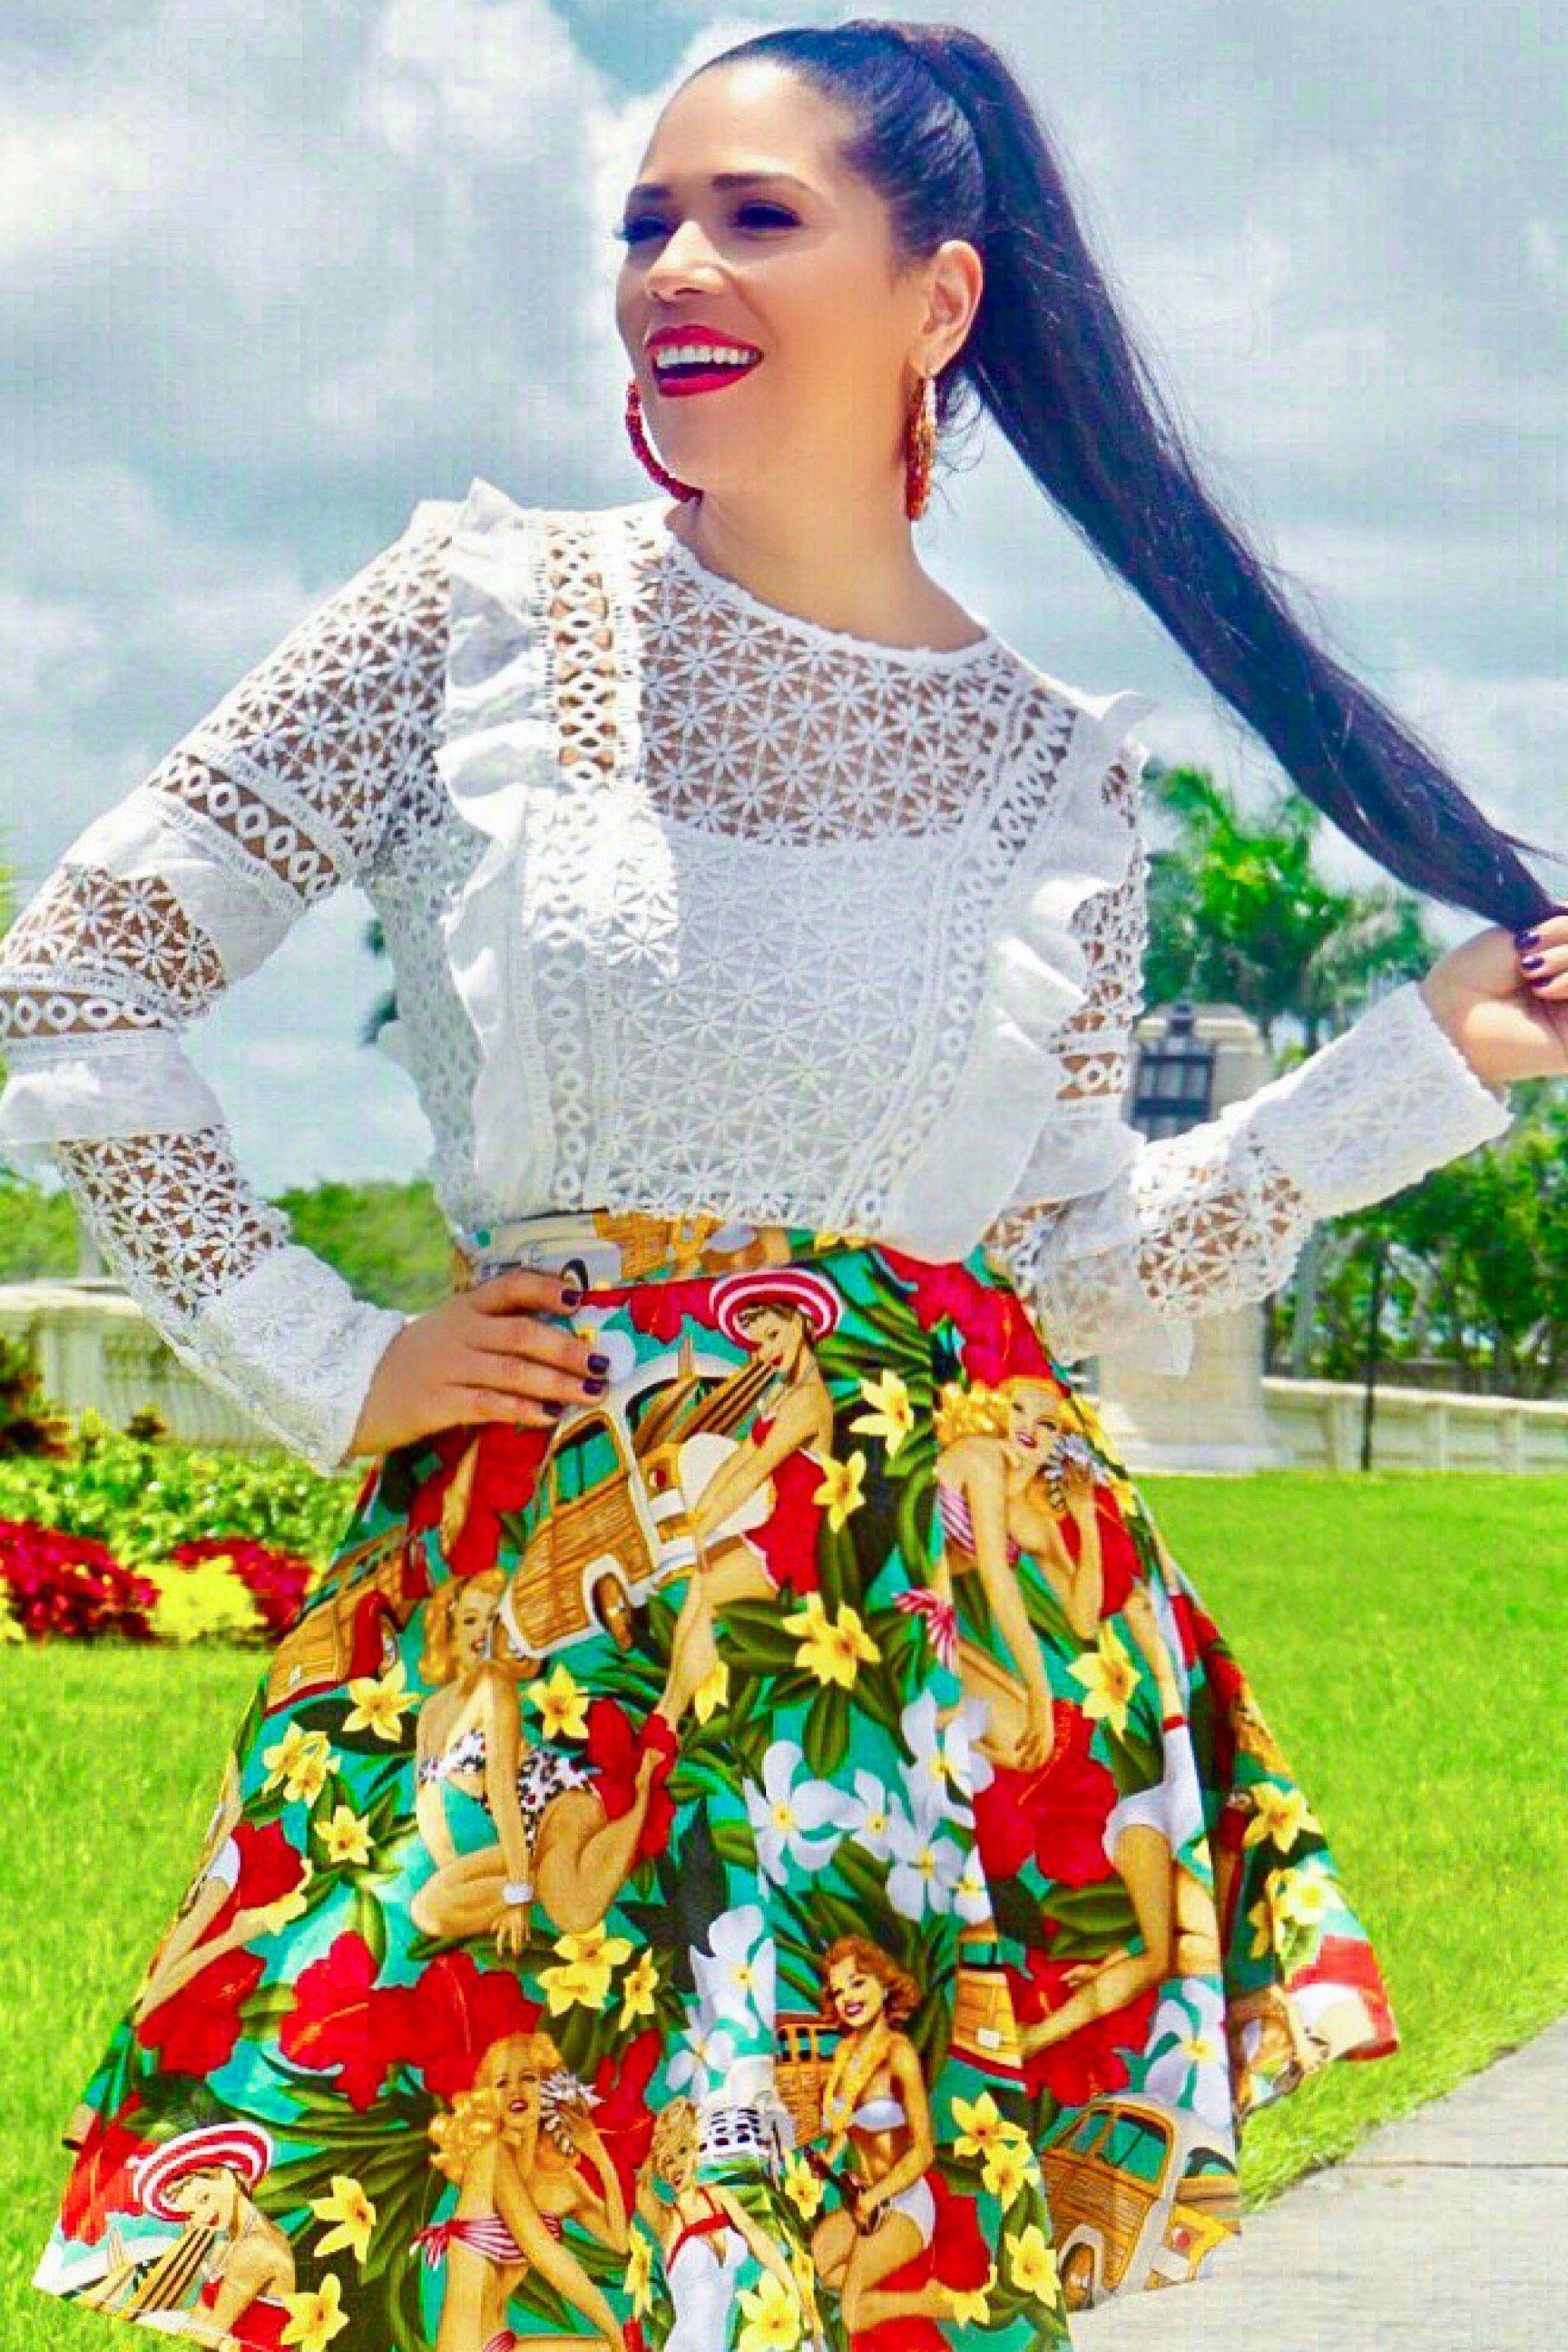 Sloane elegant boutique hollow out long sleeve blouse new arrivals